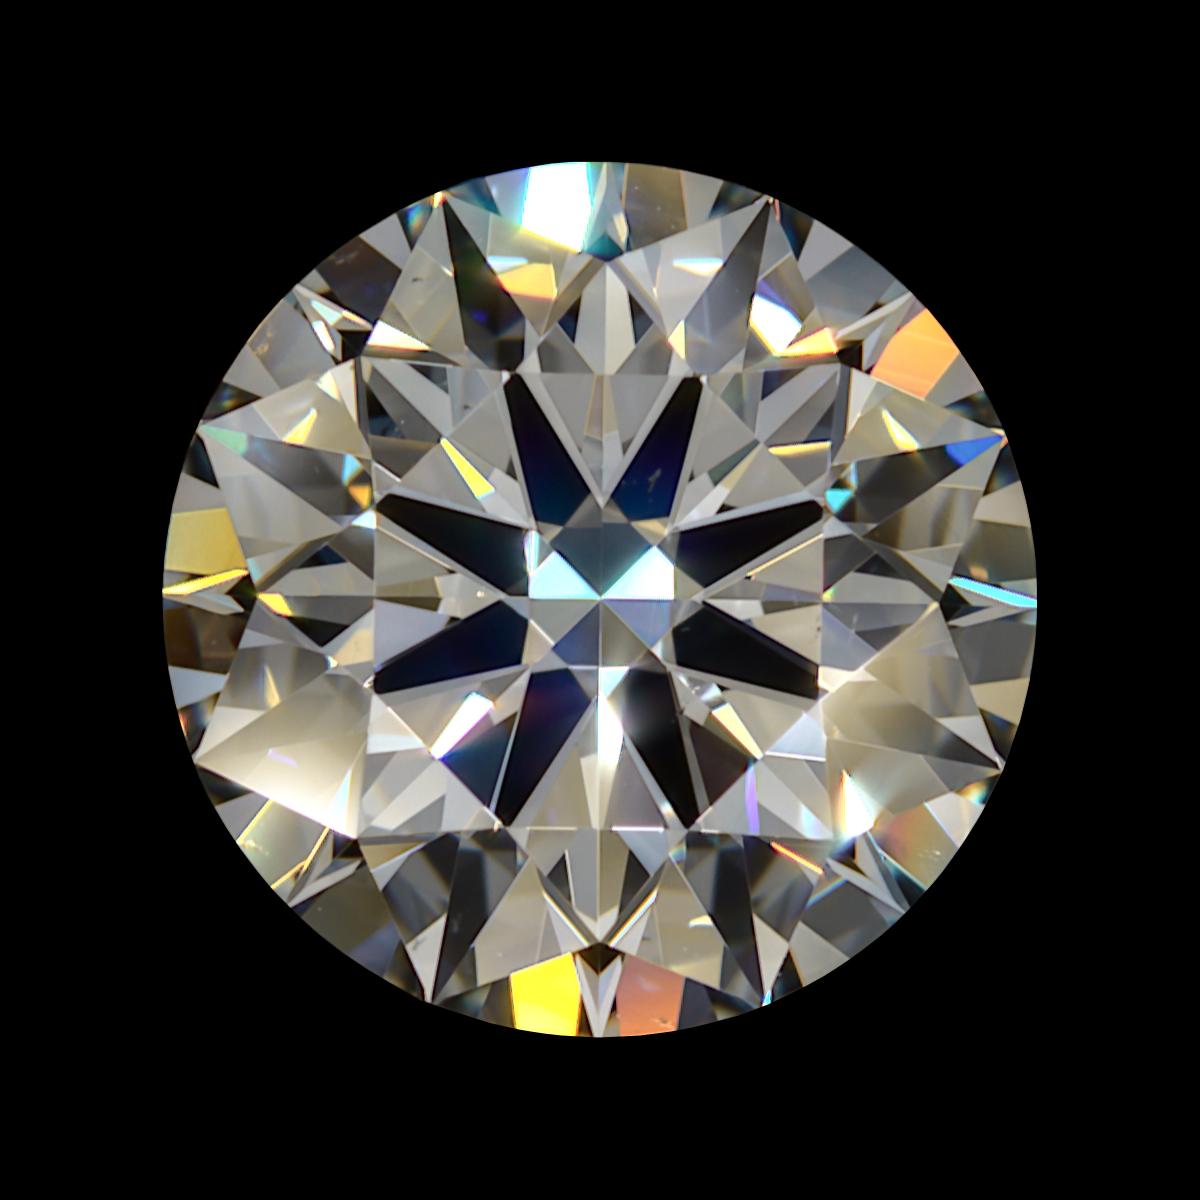 https://cdn.briangavindiamonds.com/files/mp4/AGS-104114551014/AGS-104114551014-Fire-02.mp4